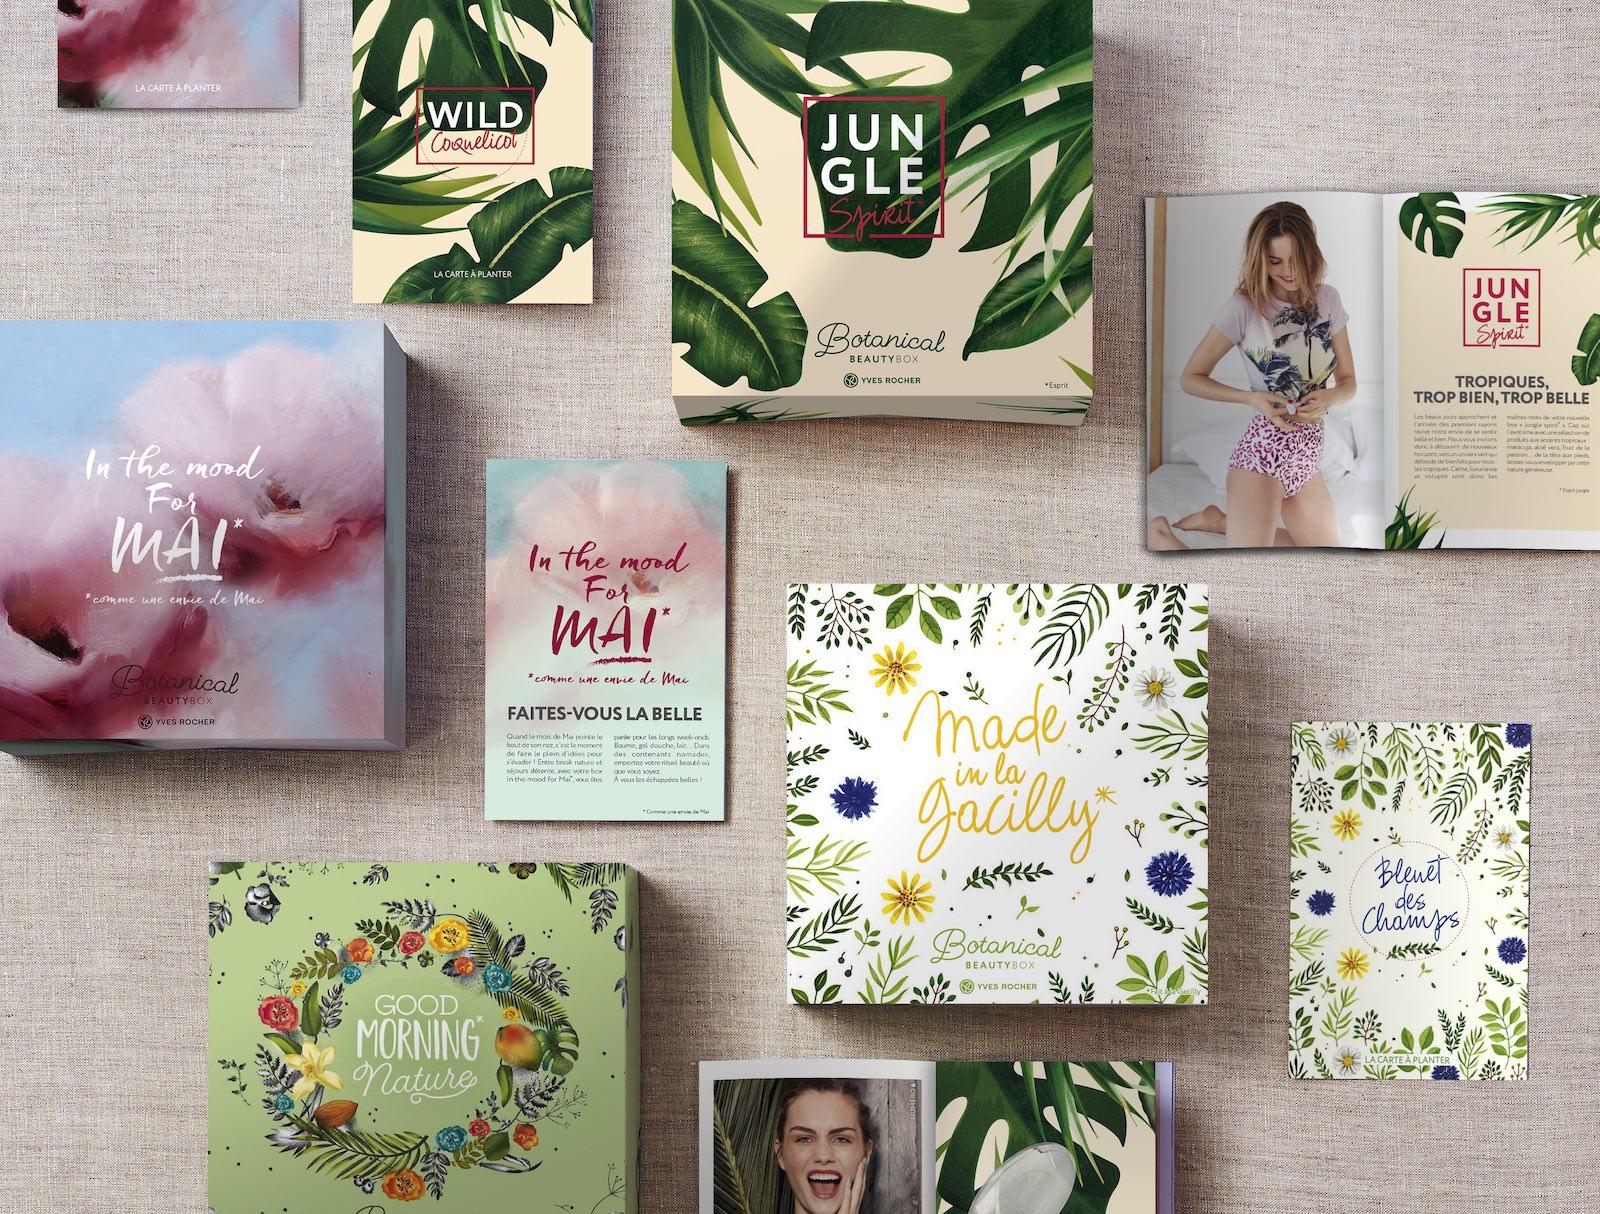 Yves Rocher Notchup Botanical Beauty Box printemps 2018